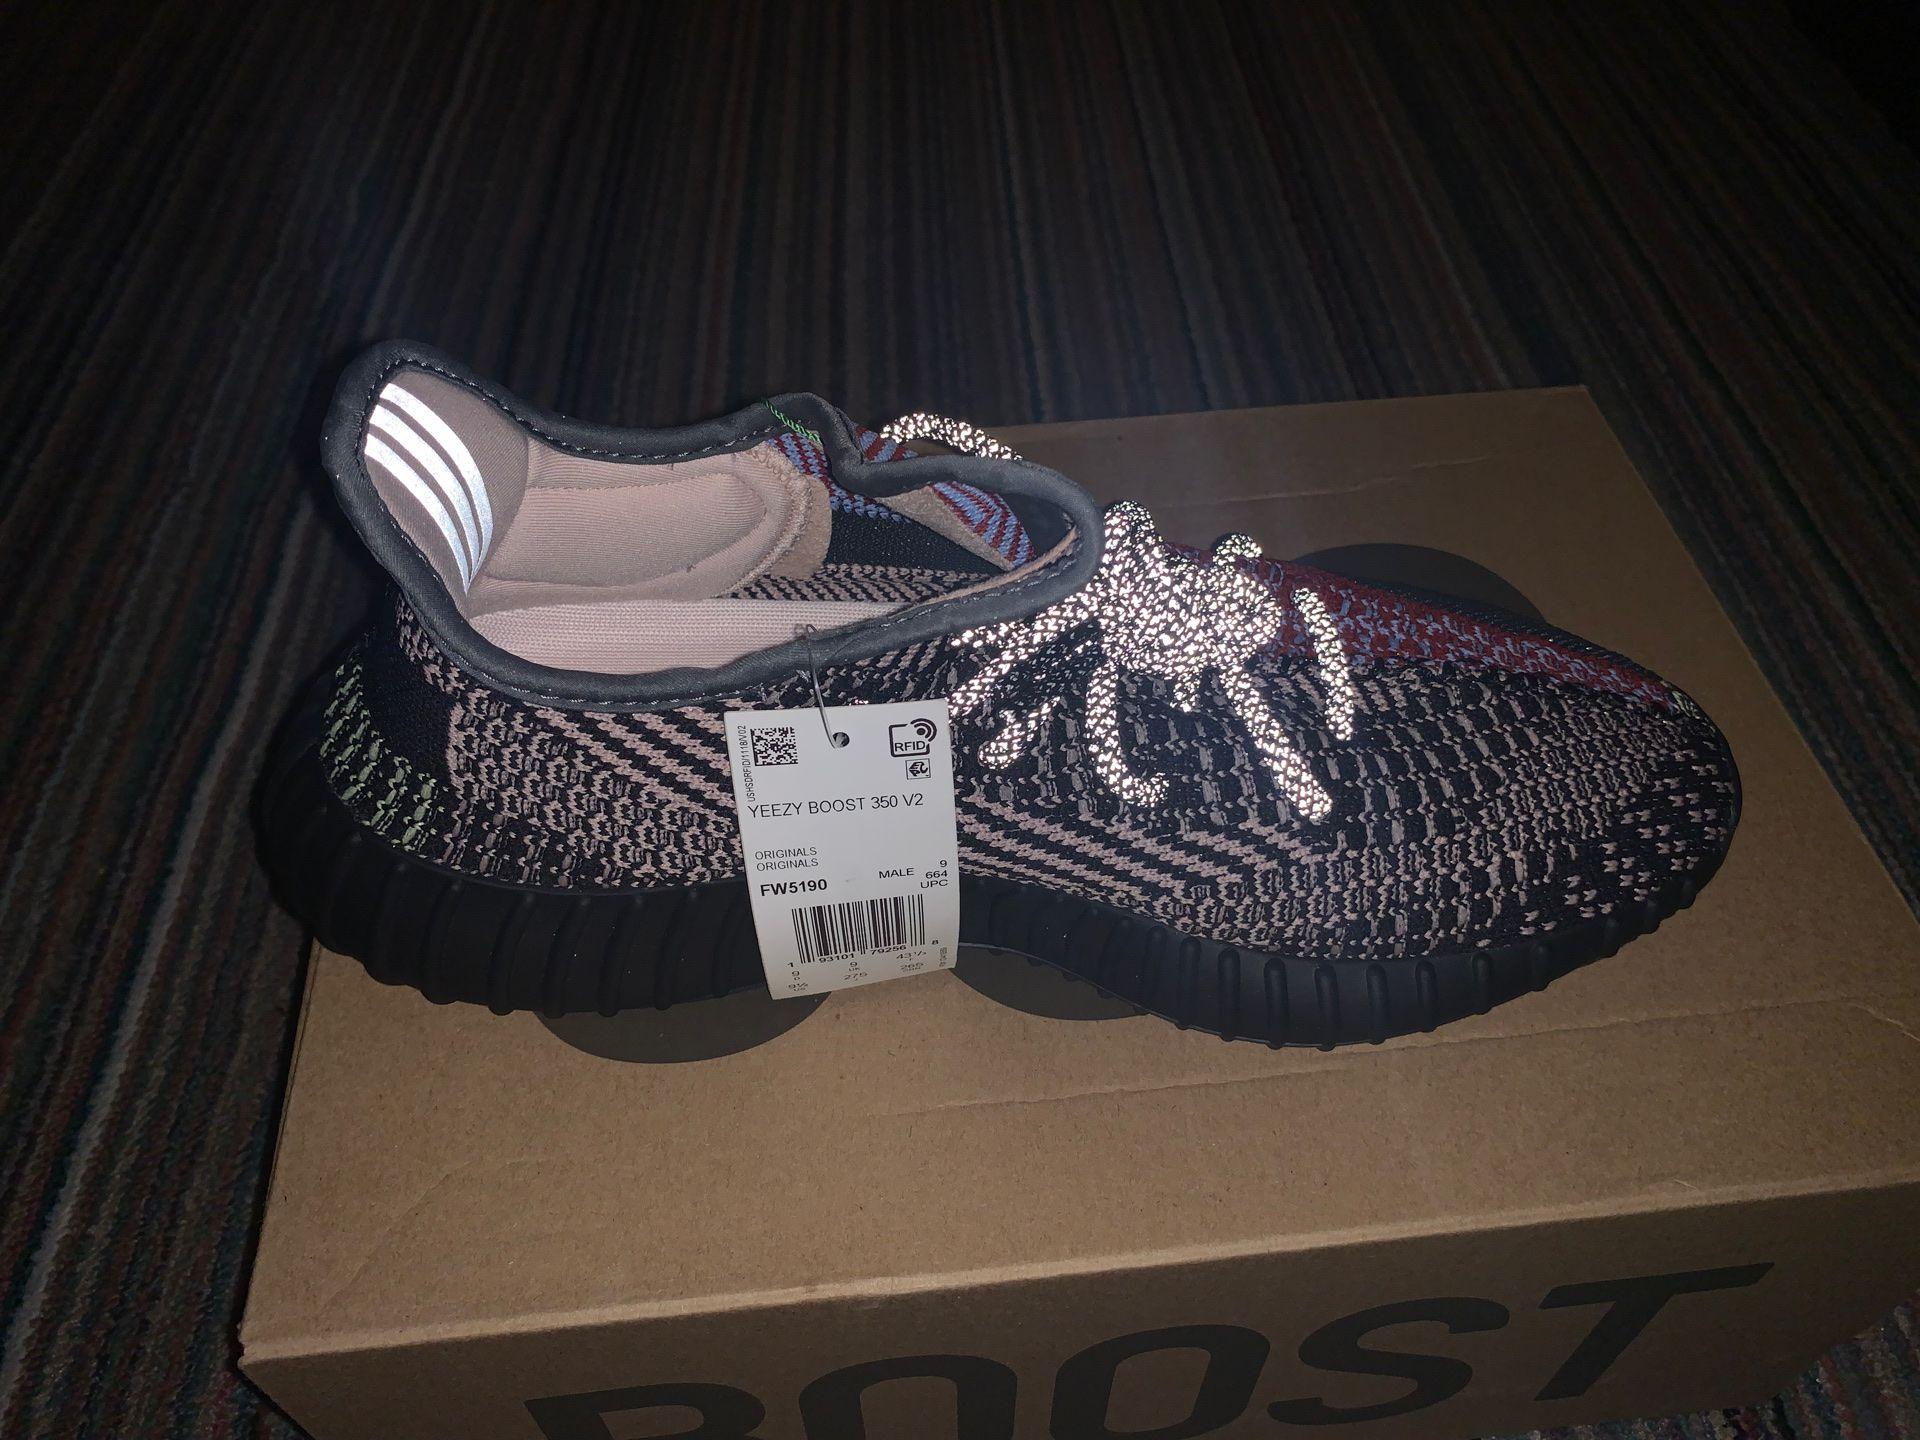 Men Adidas Yeezy Boost 350 V2 Yecheil (Non reflective)